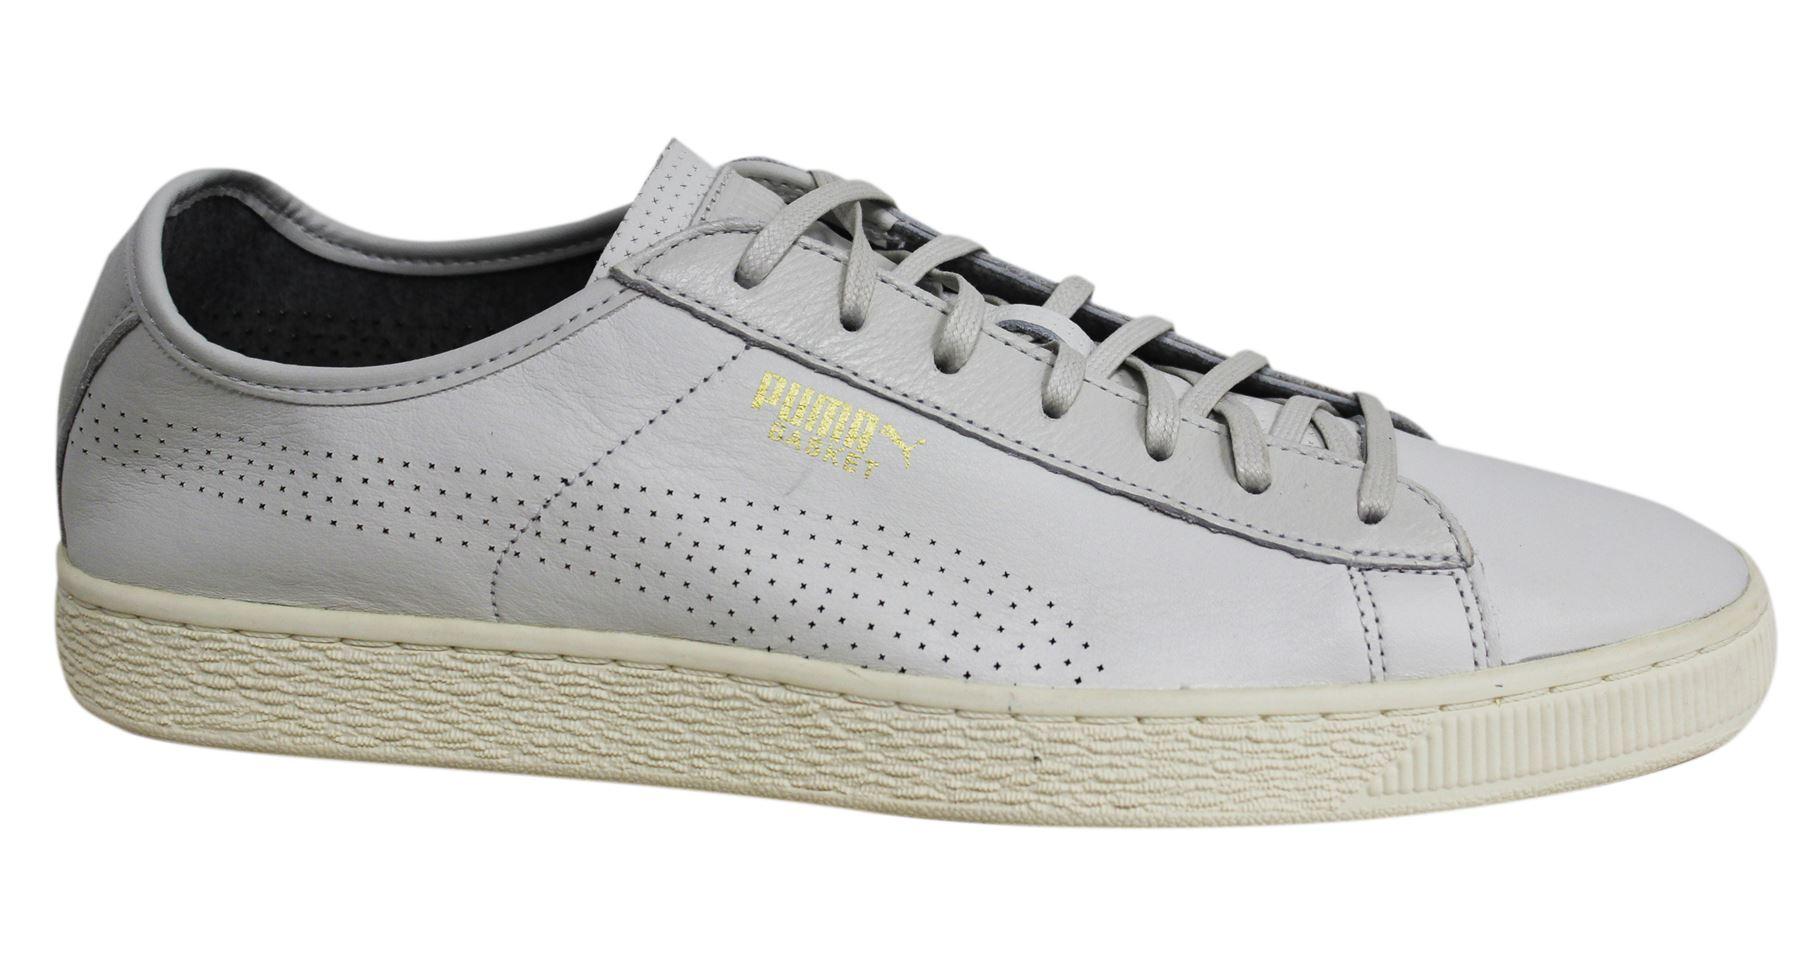 33a70b91d78d Puma Basket Classic Soft Off White Leather Lace Up Mens Trainers 363824 04  D50